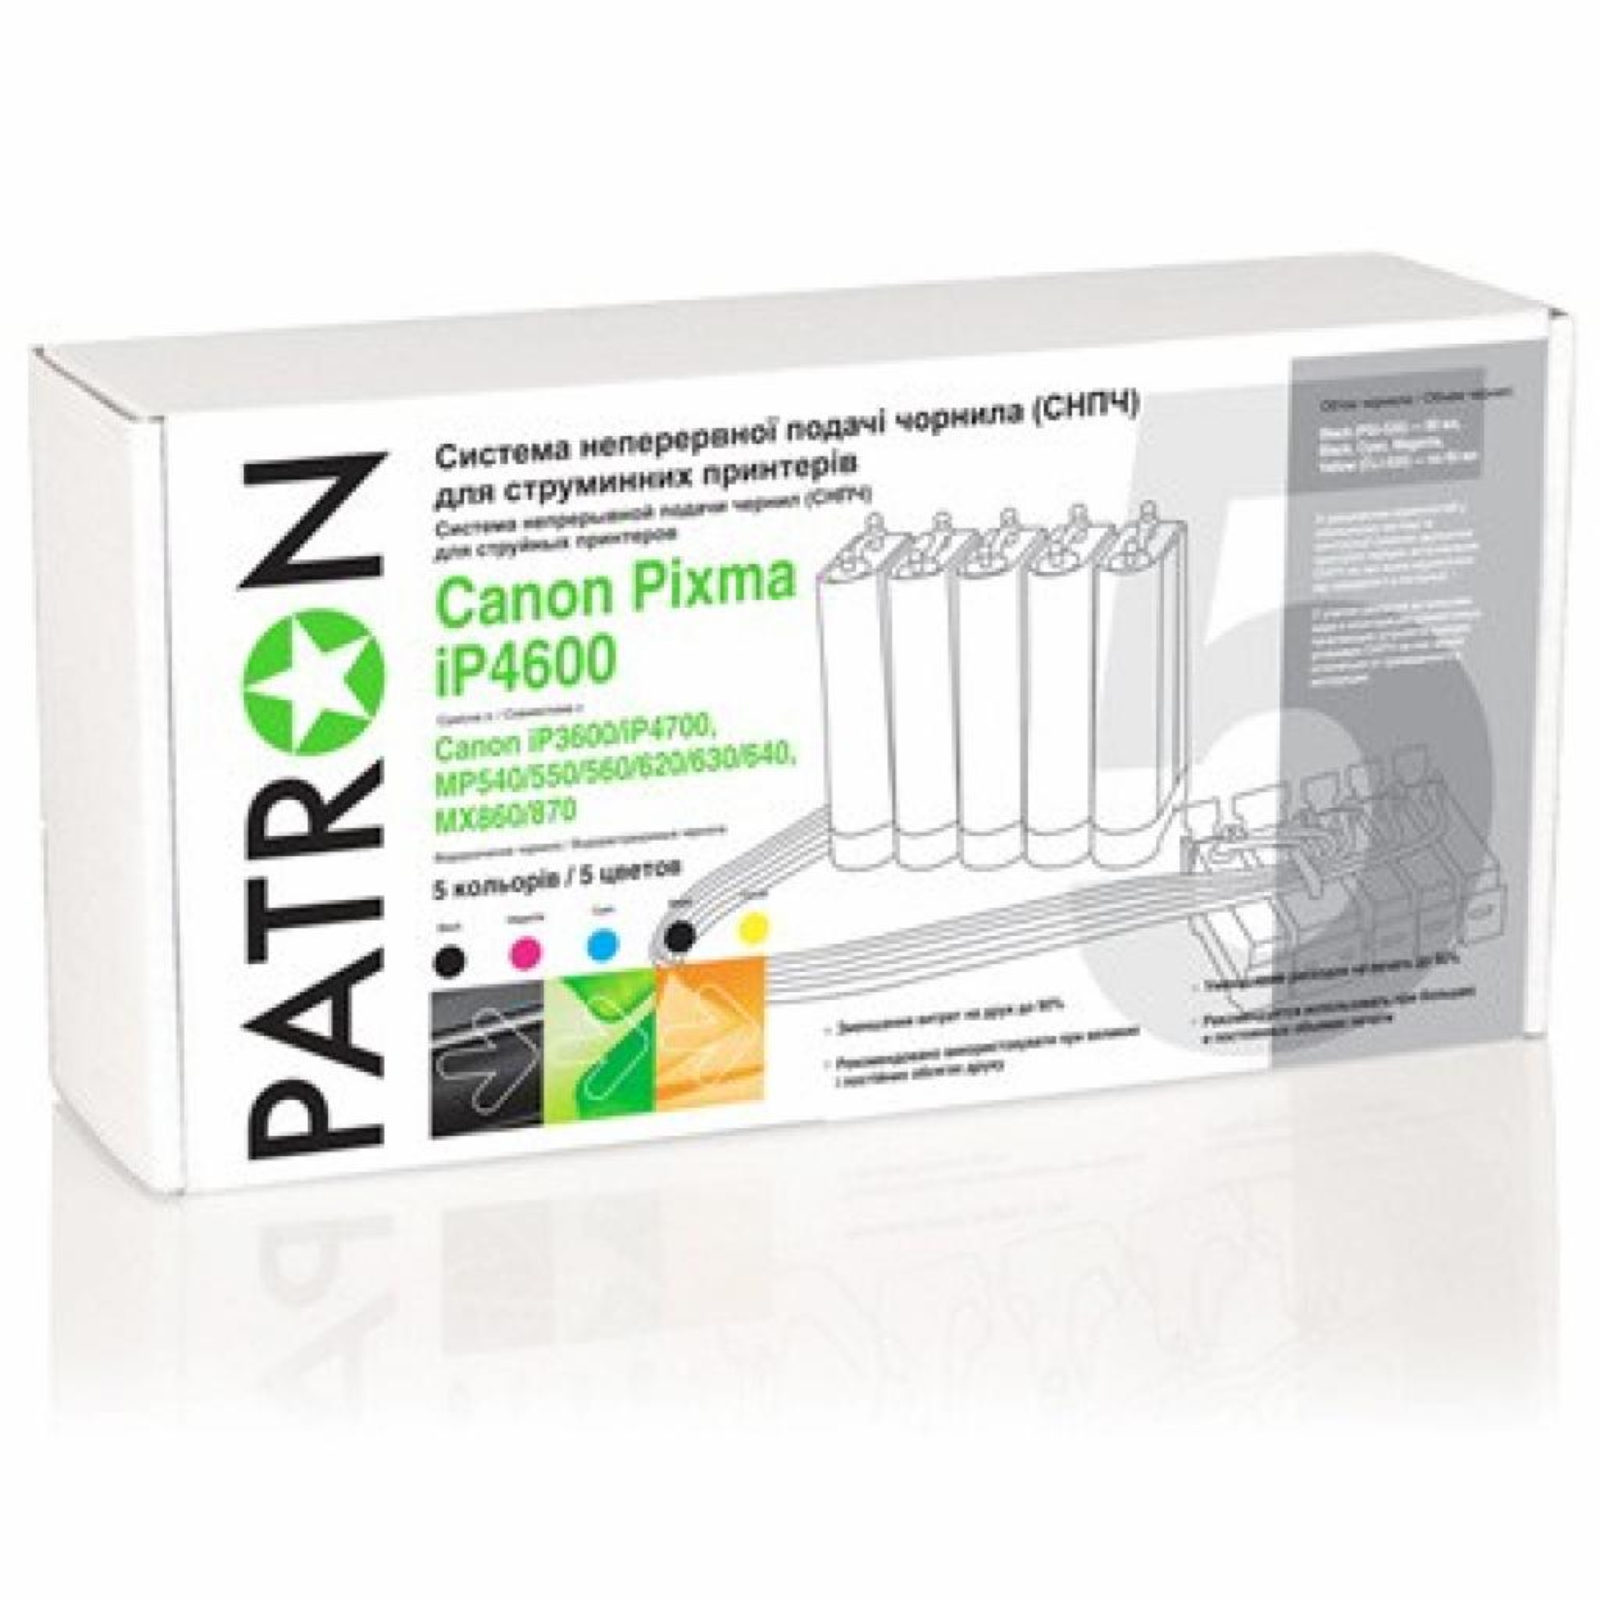 СНПЧ PATRON CANON IP3600/4600/4700/MP540/550 (CISS-PN-C-CAN-IP4600)